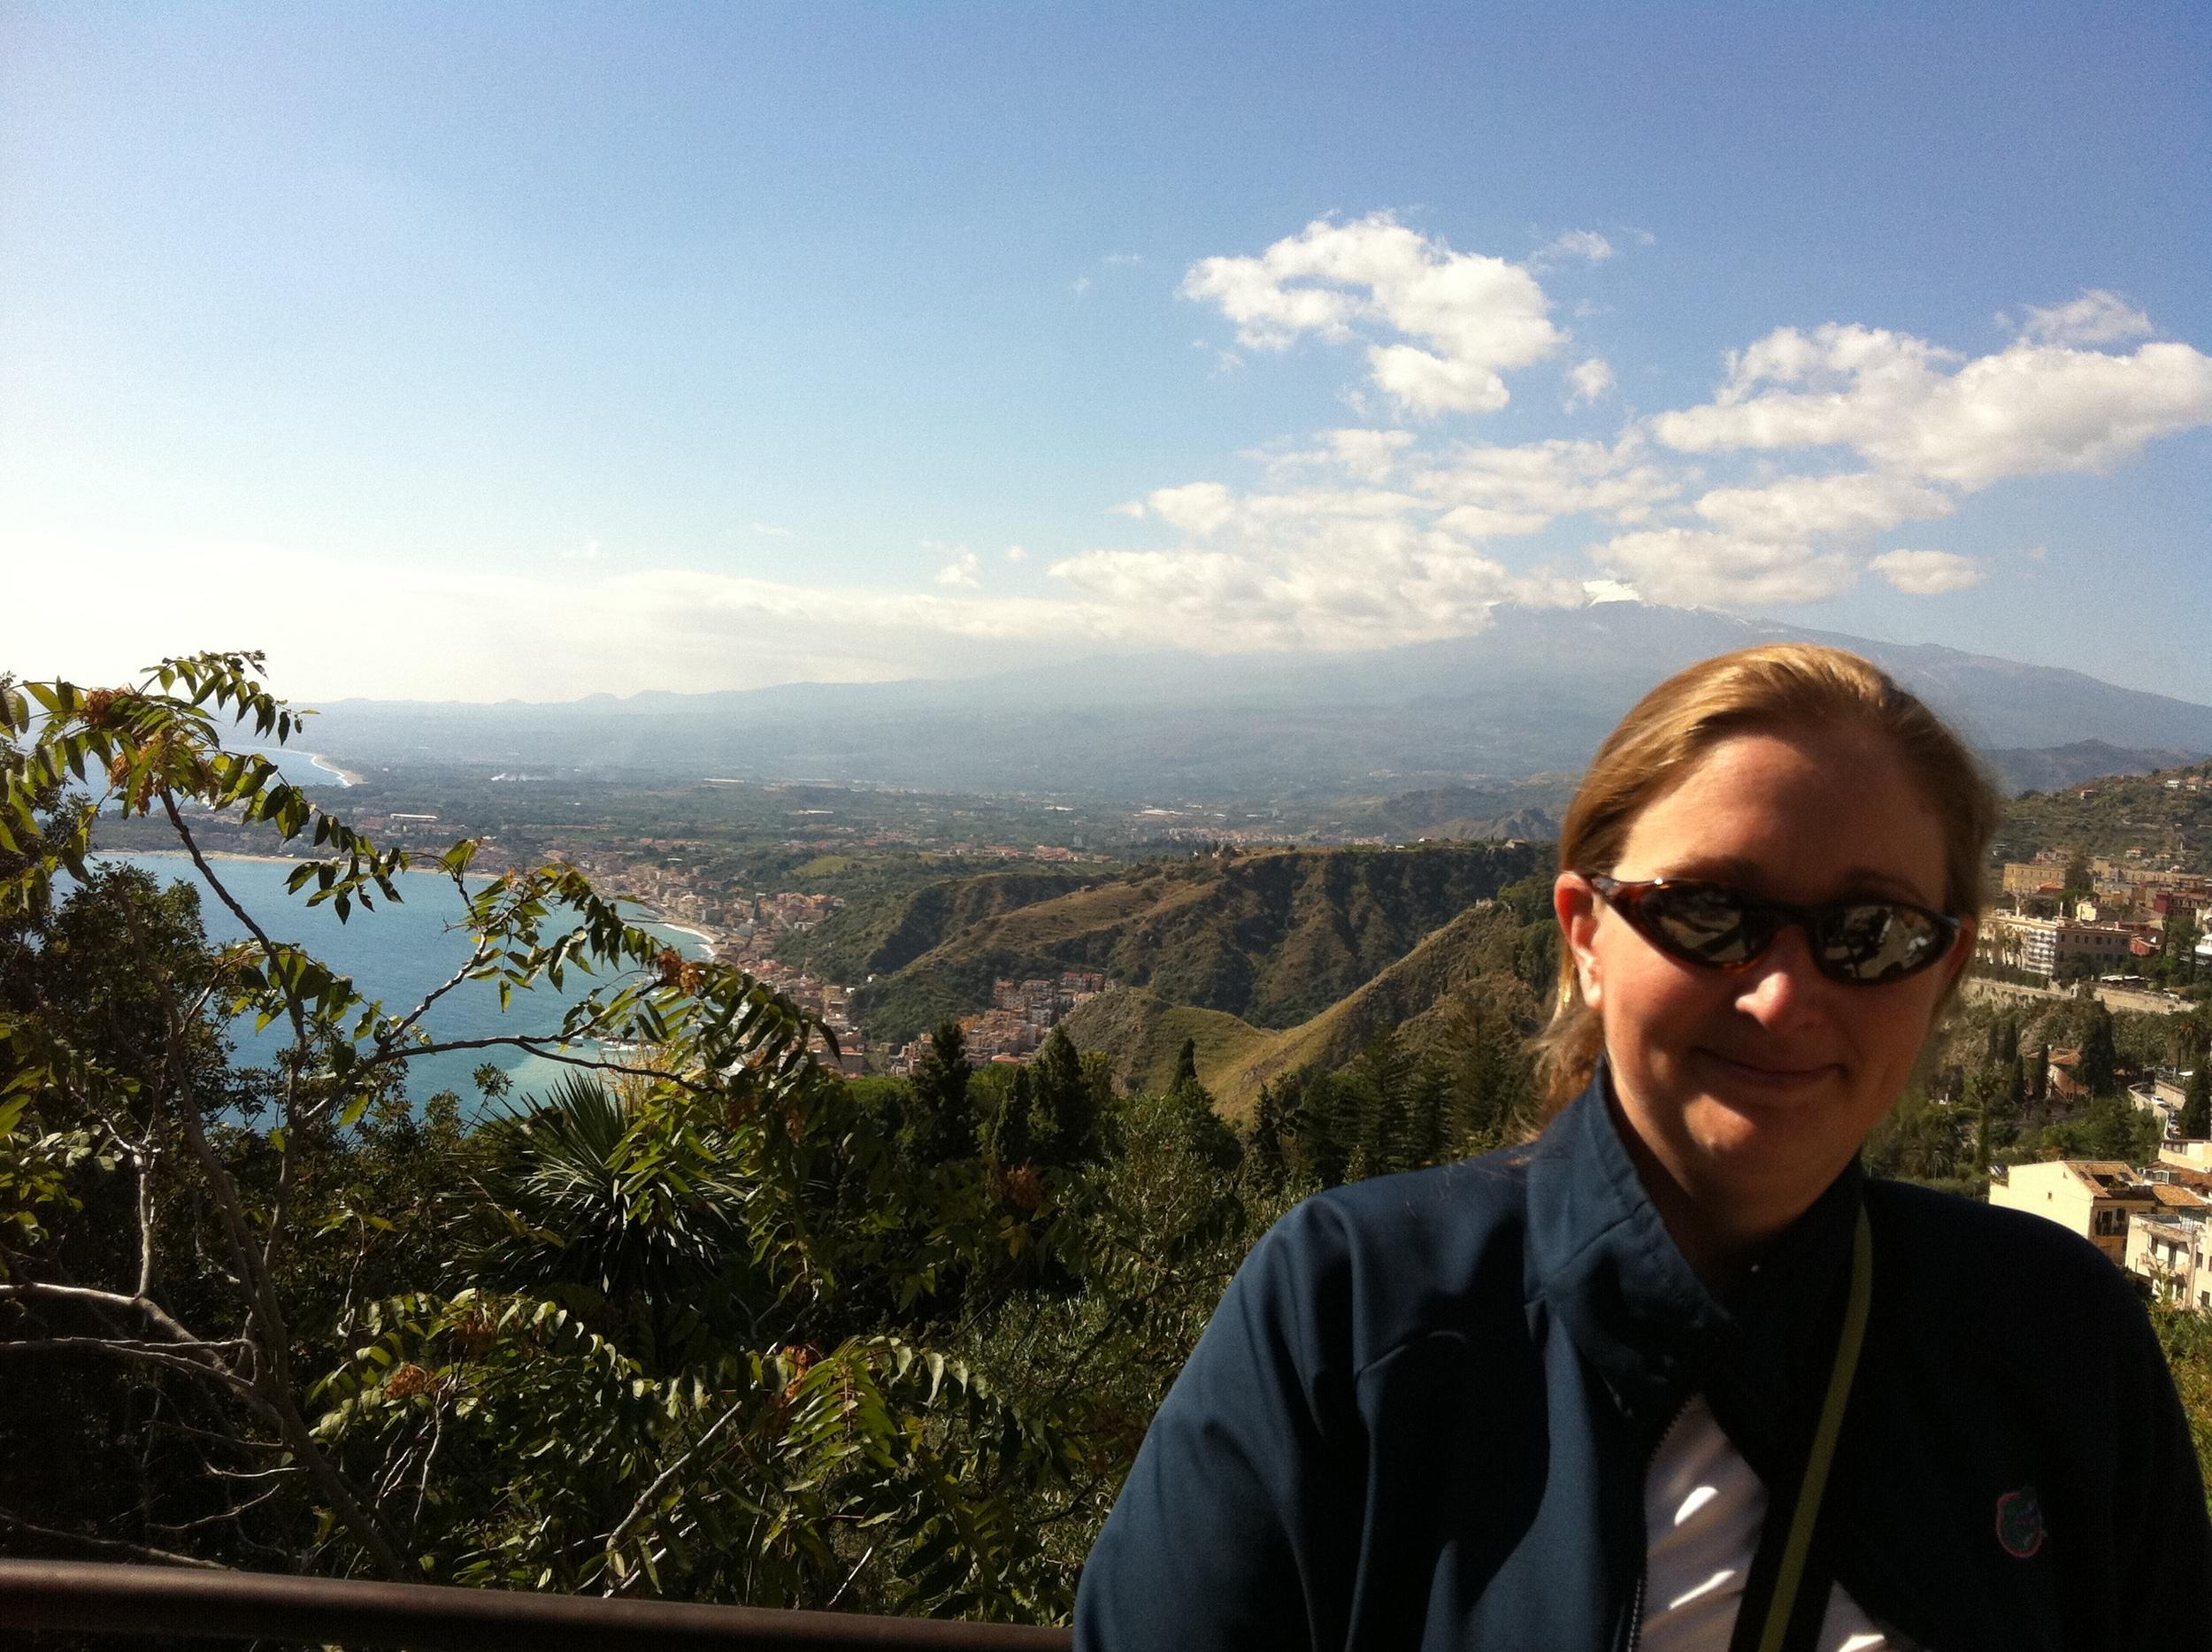 Theiri at Mt Etna, AiB Mediterranean Cruise - October 2011